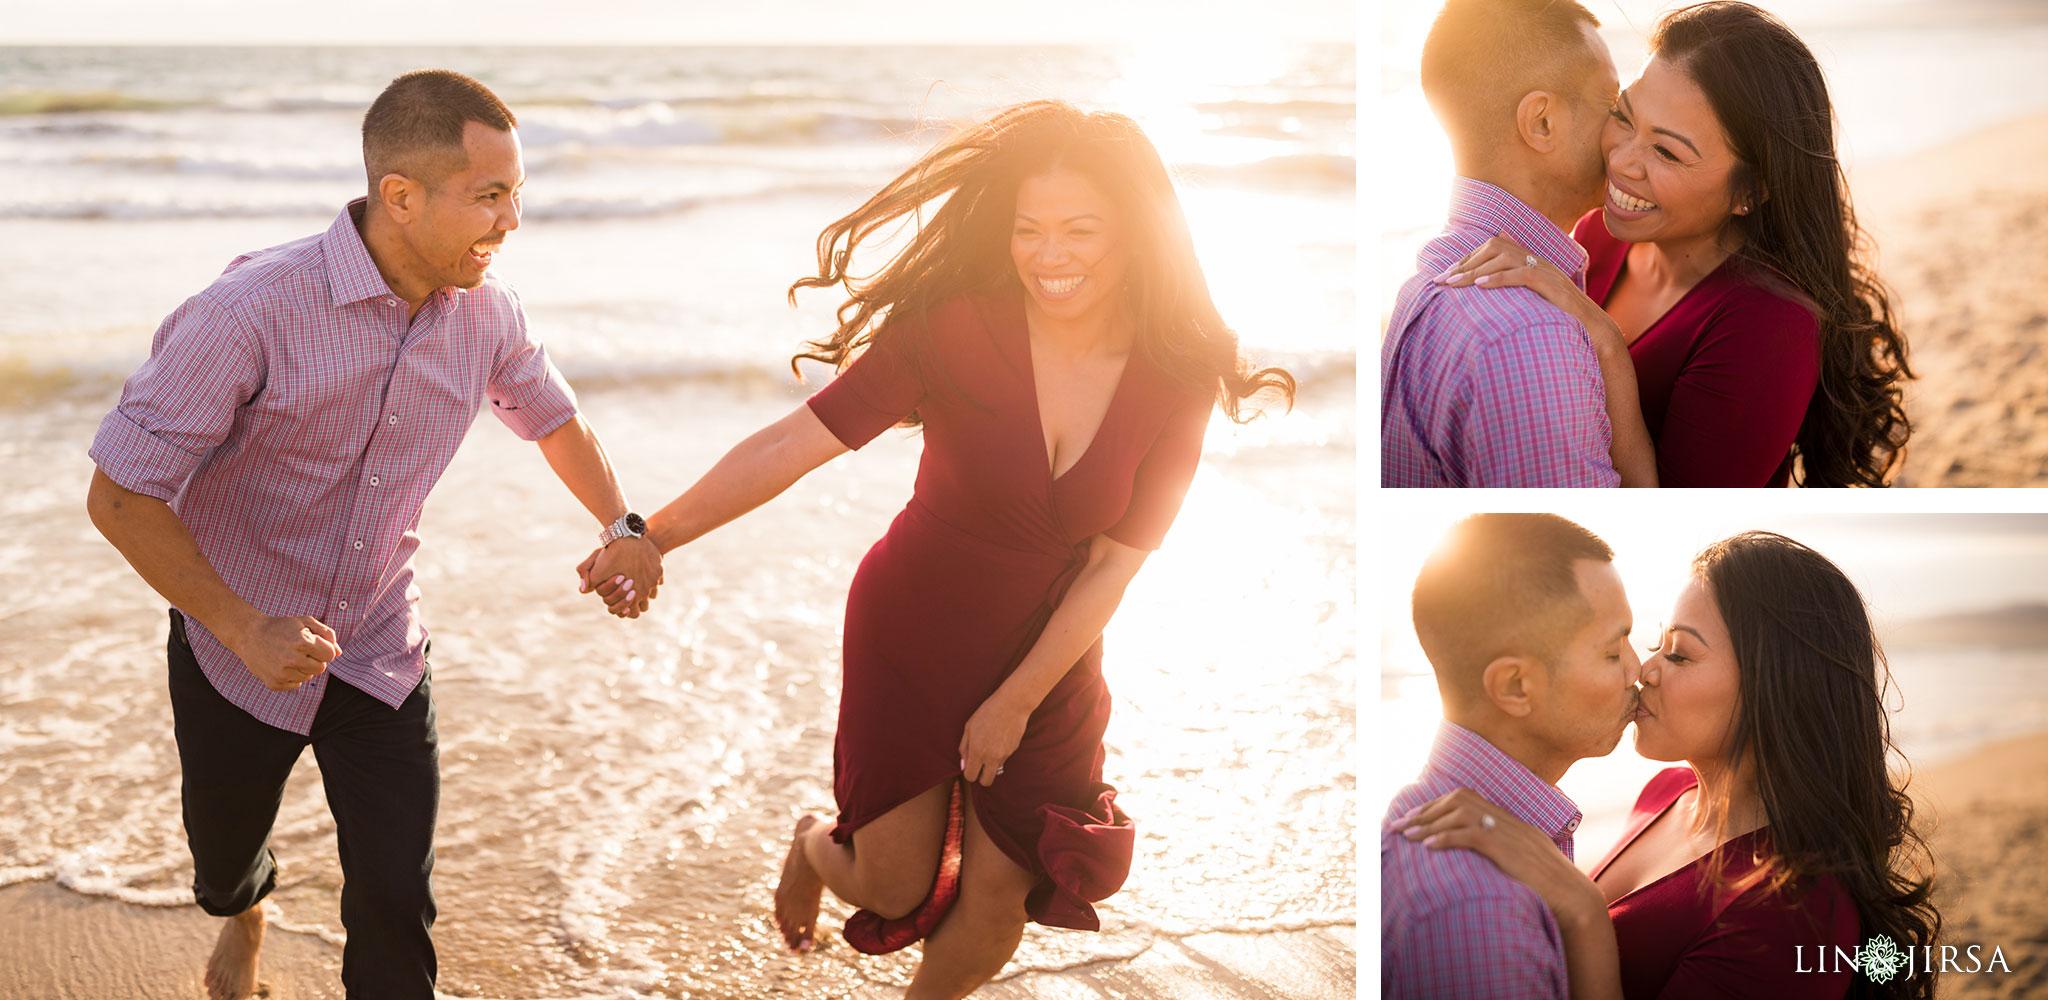 10 santa monica pier beach engagement photography